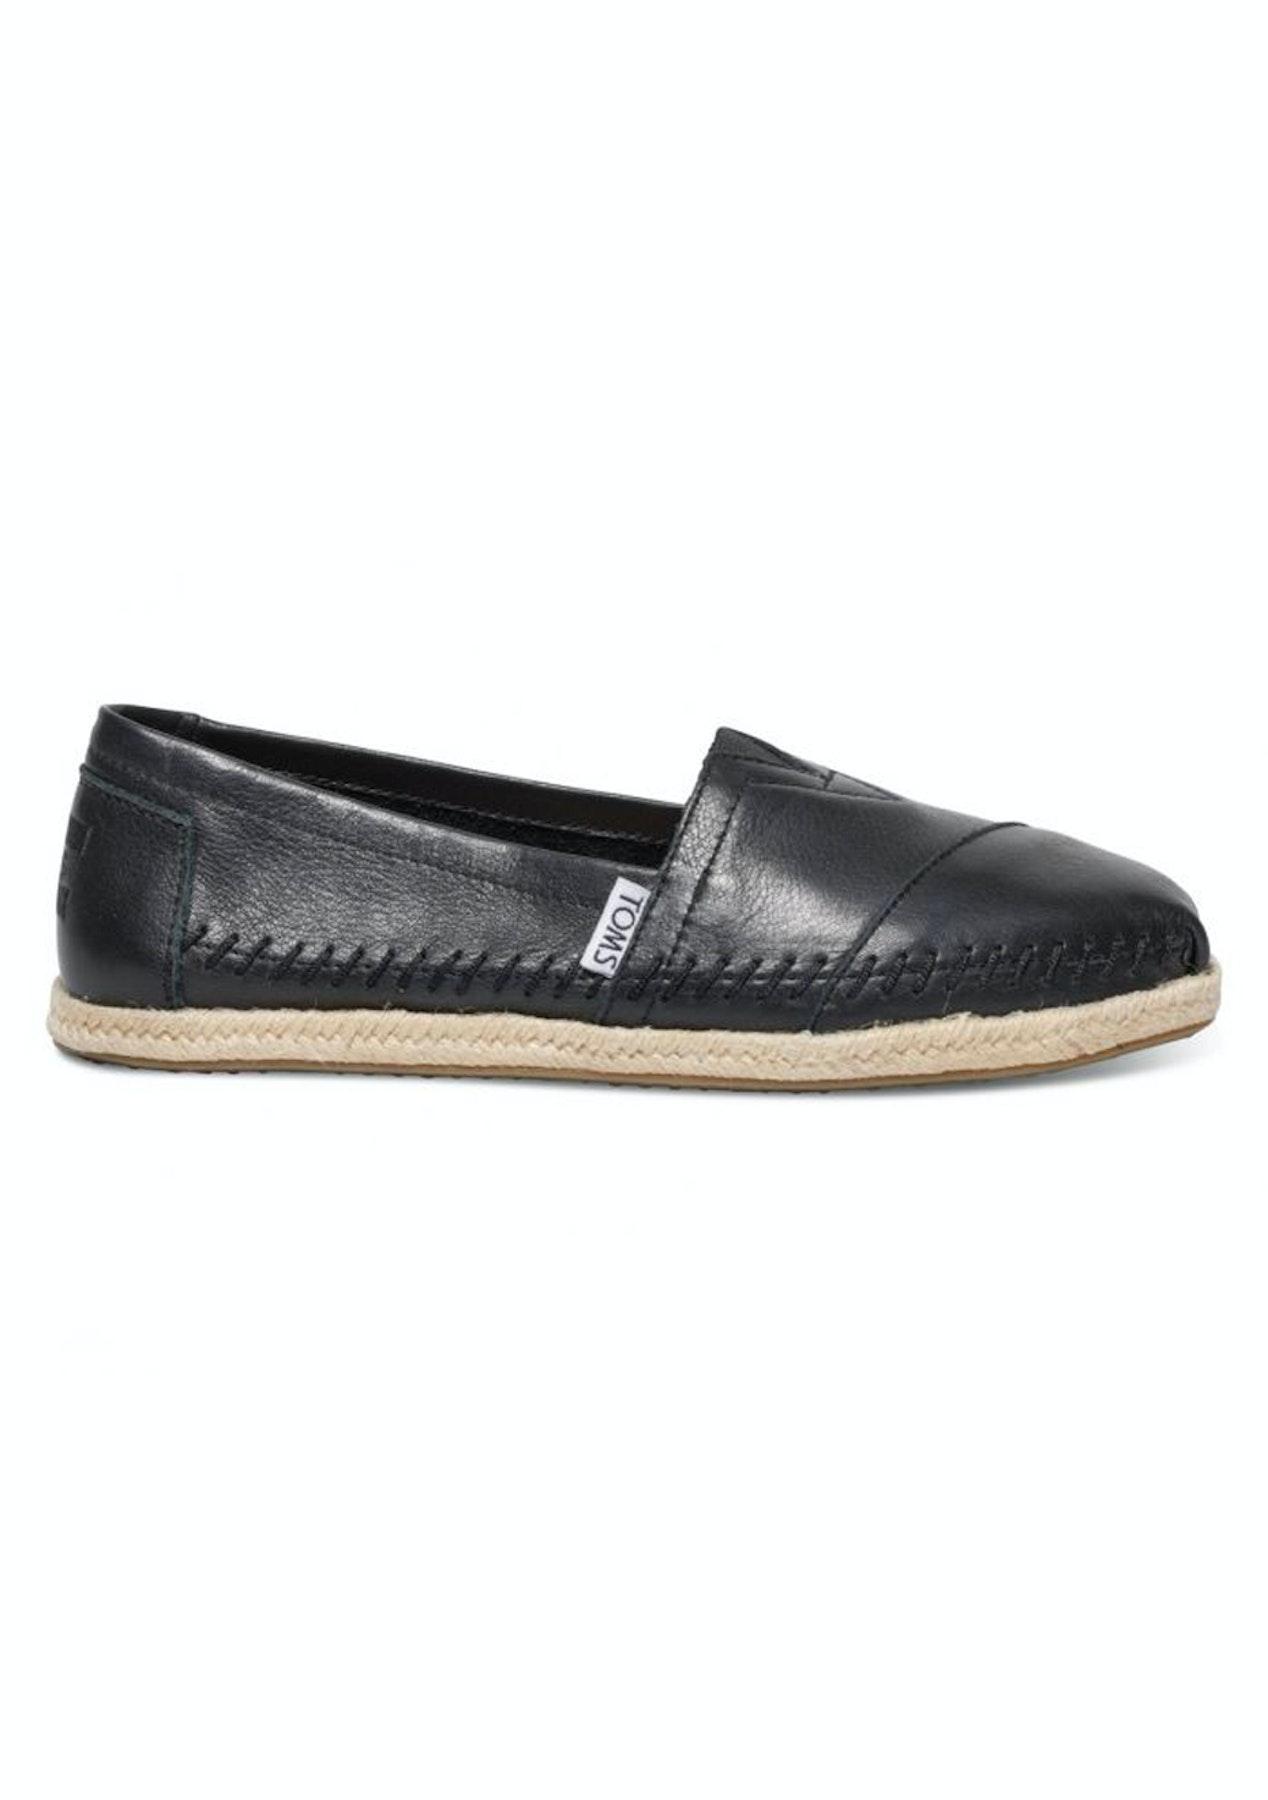 c7448fe1ed7 Toms - WomensLeather Aplpargata - Black - Shoes Garage Sale - Onceit